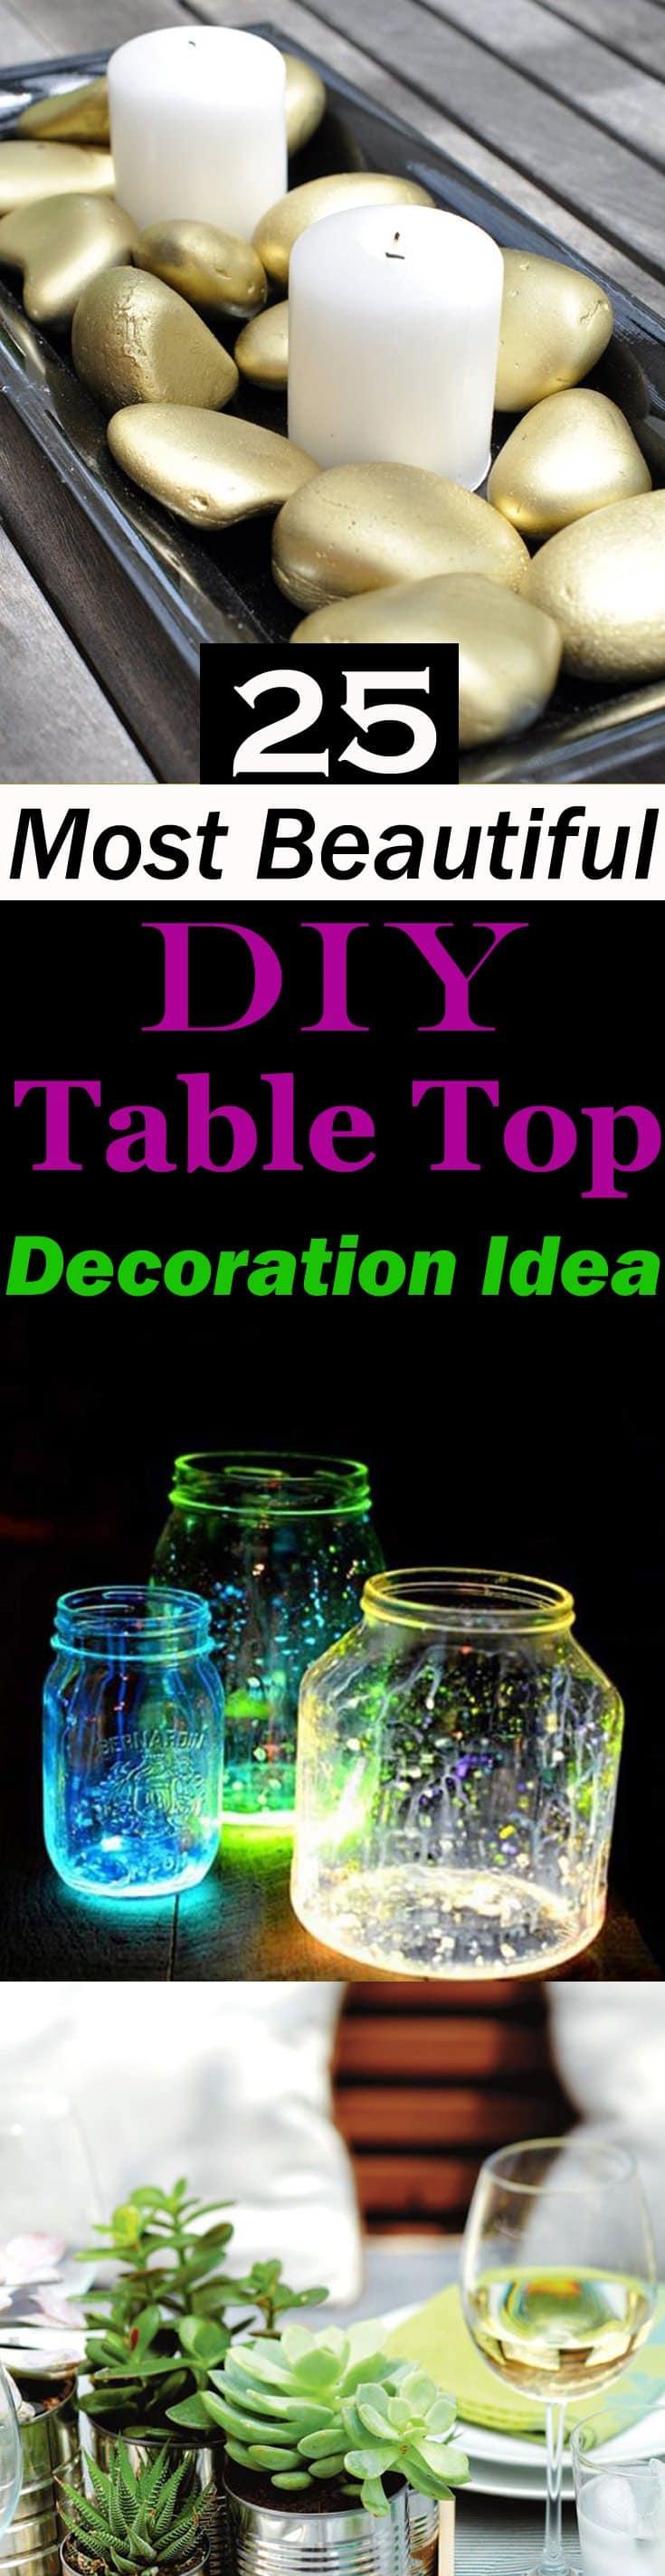 Best Decoration Ideas: 25 Most Beautiful DIY Table Top Decoration Ideas